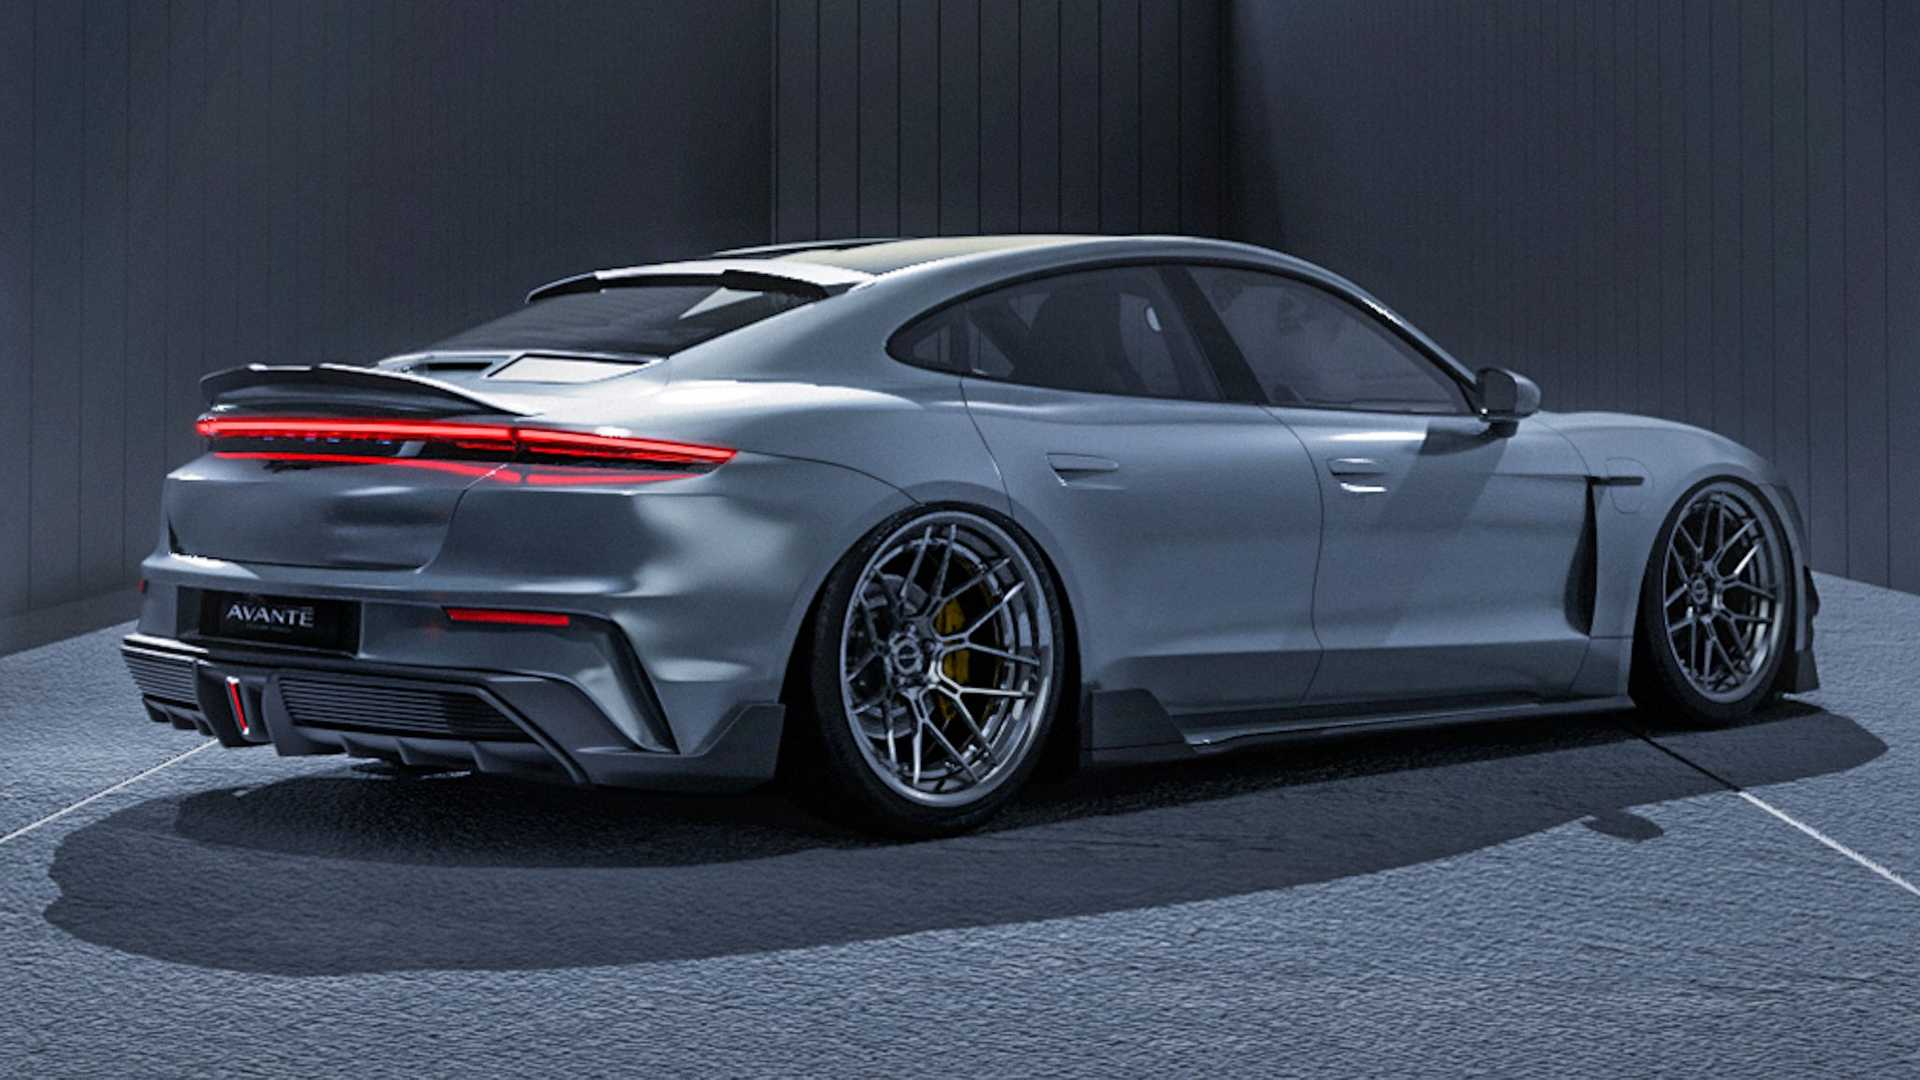 Porsche-Taycan-by-Avante-Design-18